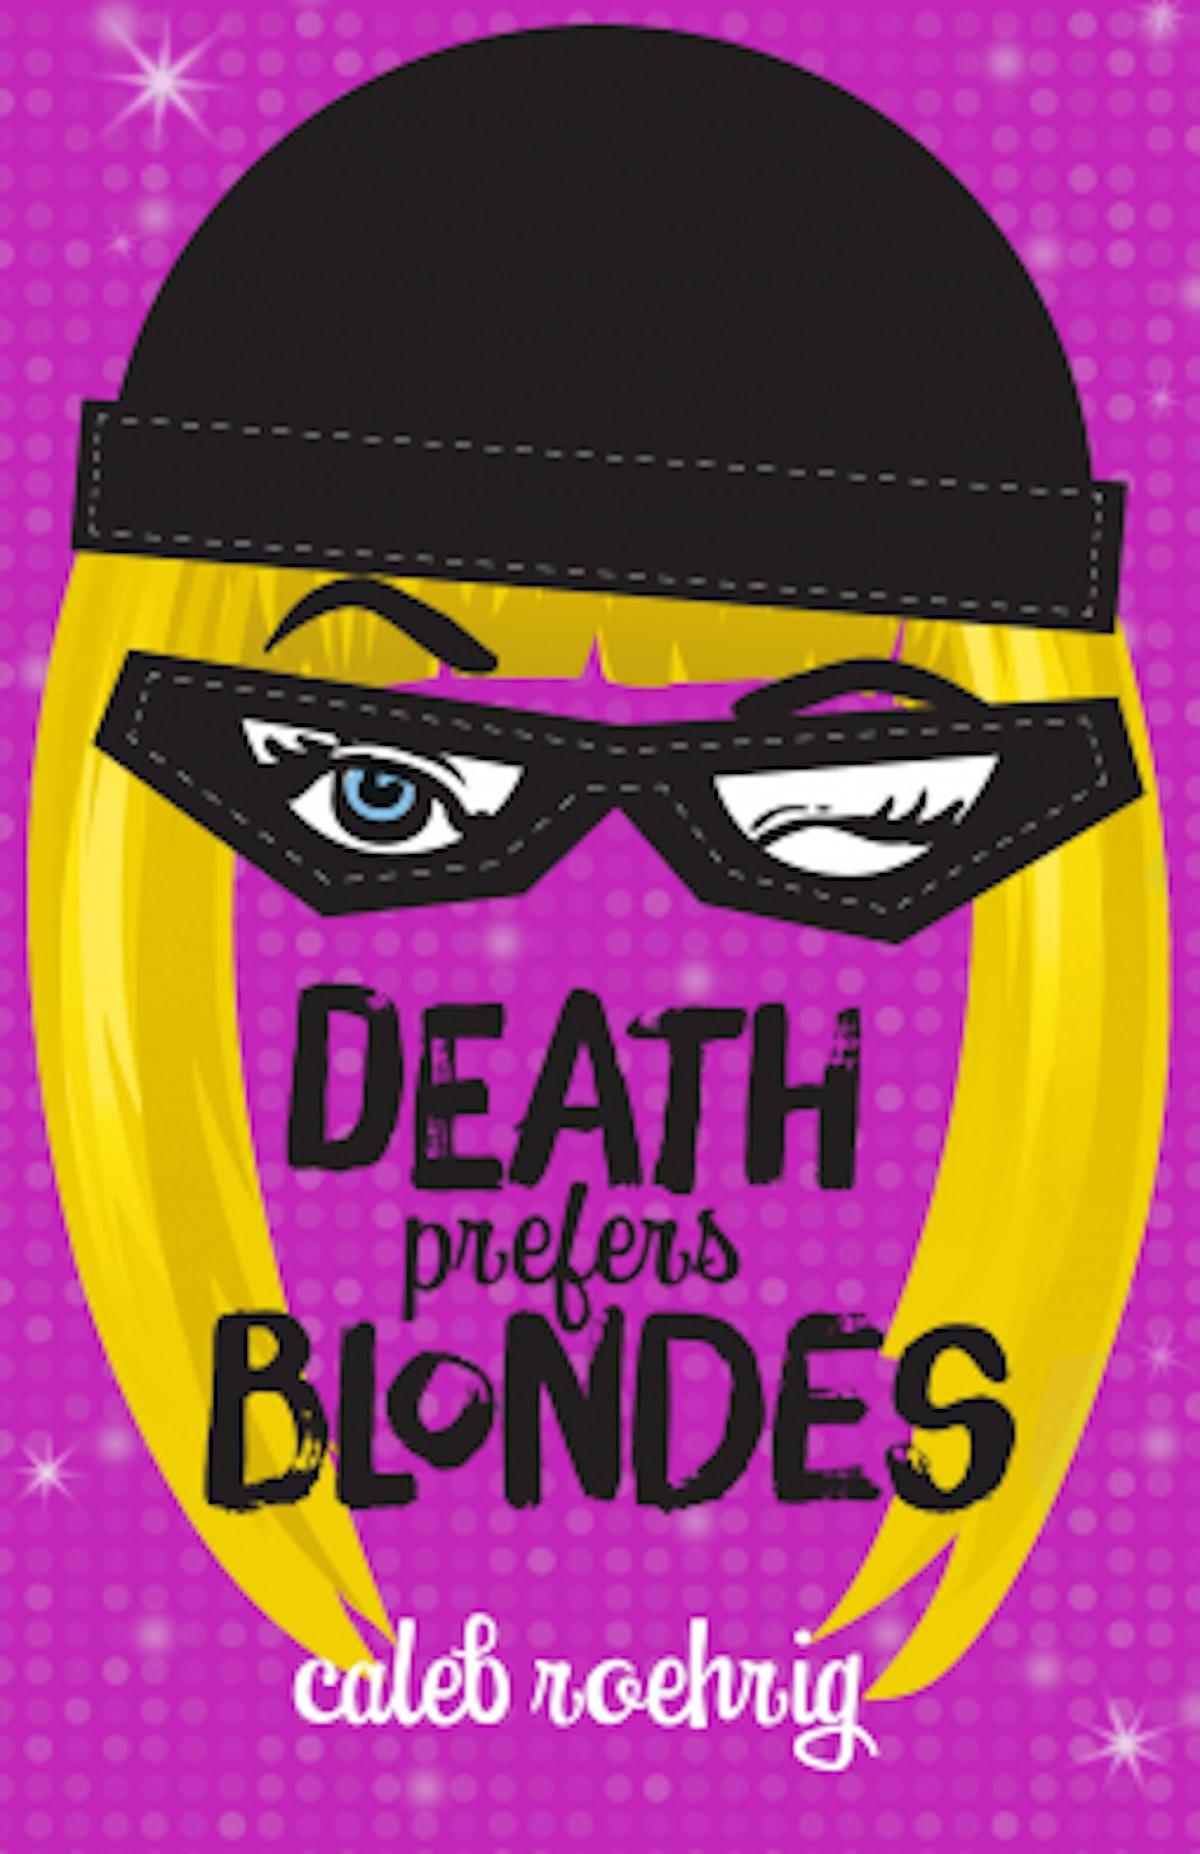 'Death Prefers Blondes' by Caleb Roehrig